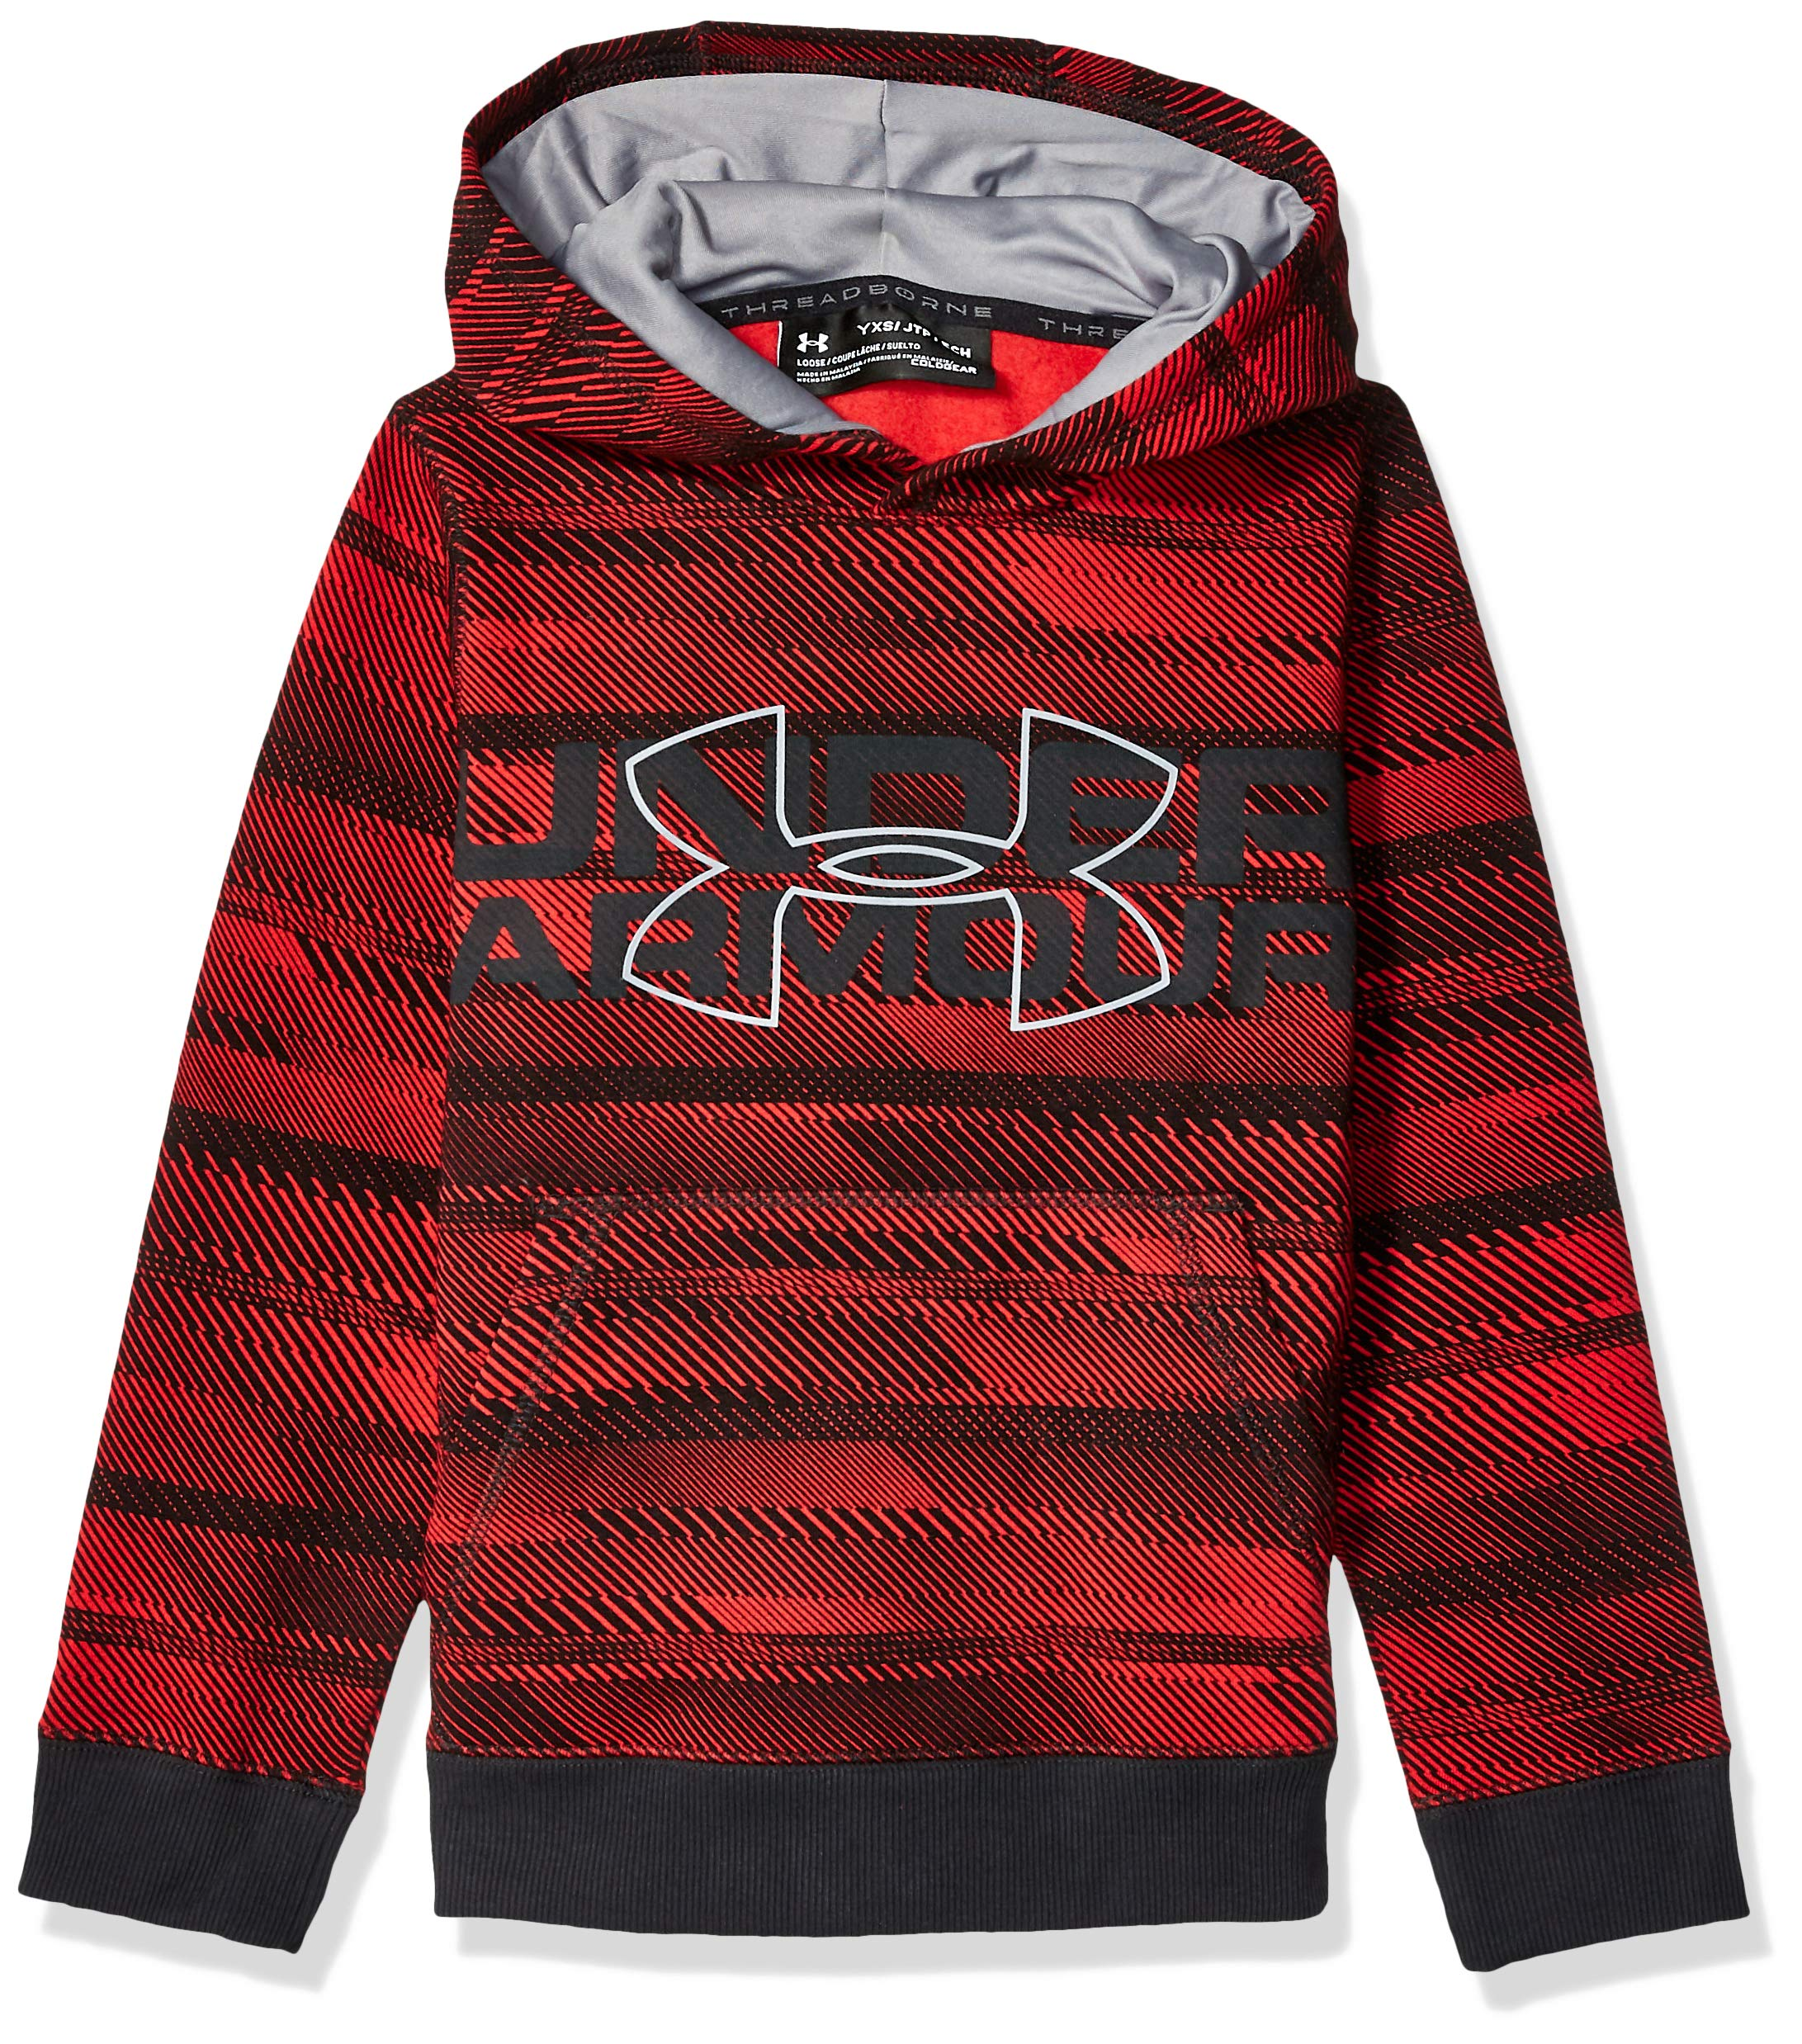 Under Armour Boys' Threadborne Nov Logo Hoodie,Red /Steel, Youth Small by Under Armour